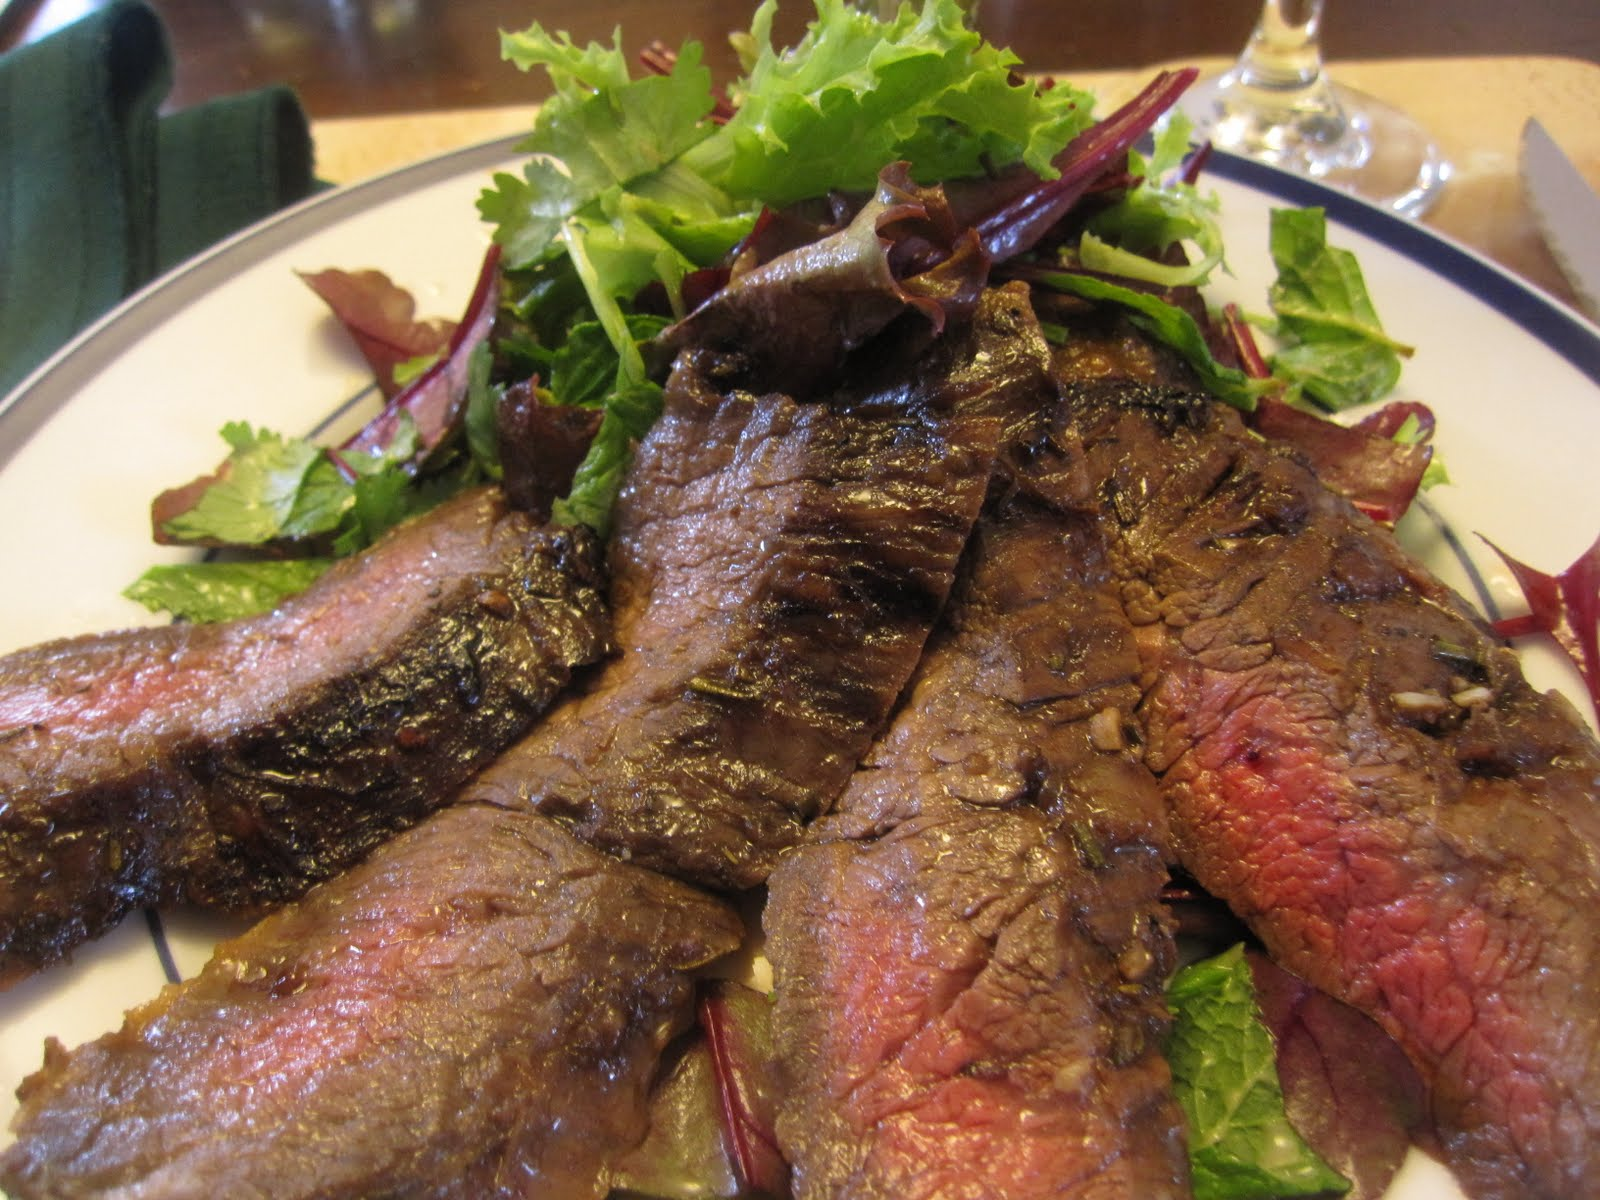 Balsamic Vinegar Marinated Skirt Steak - Recipes4EveryKitchen